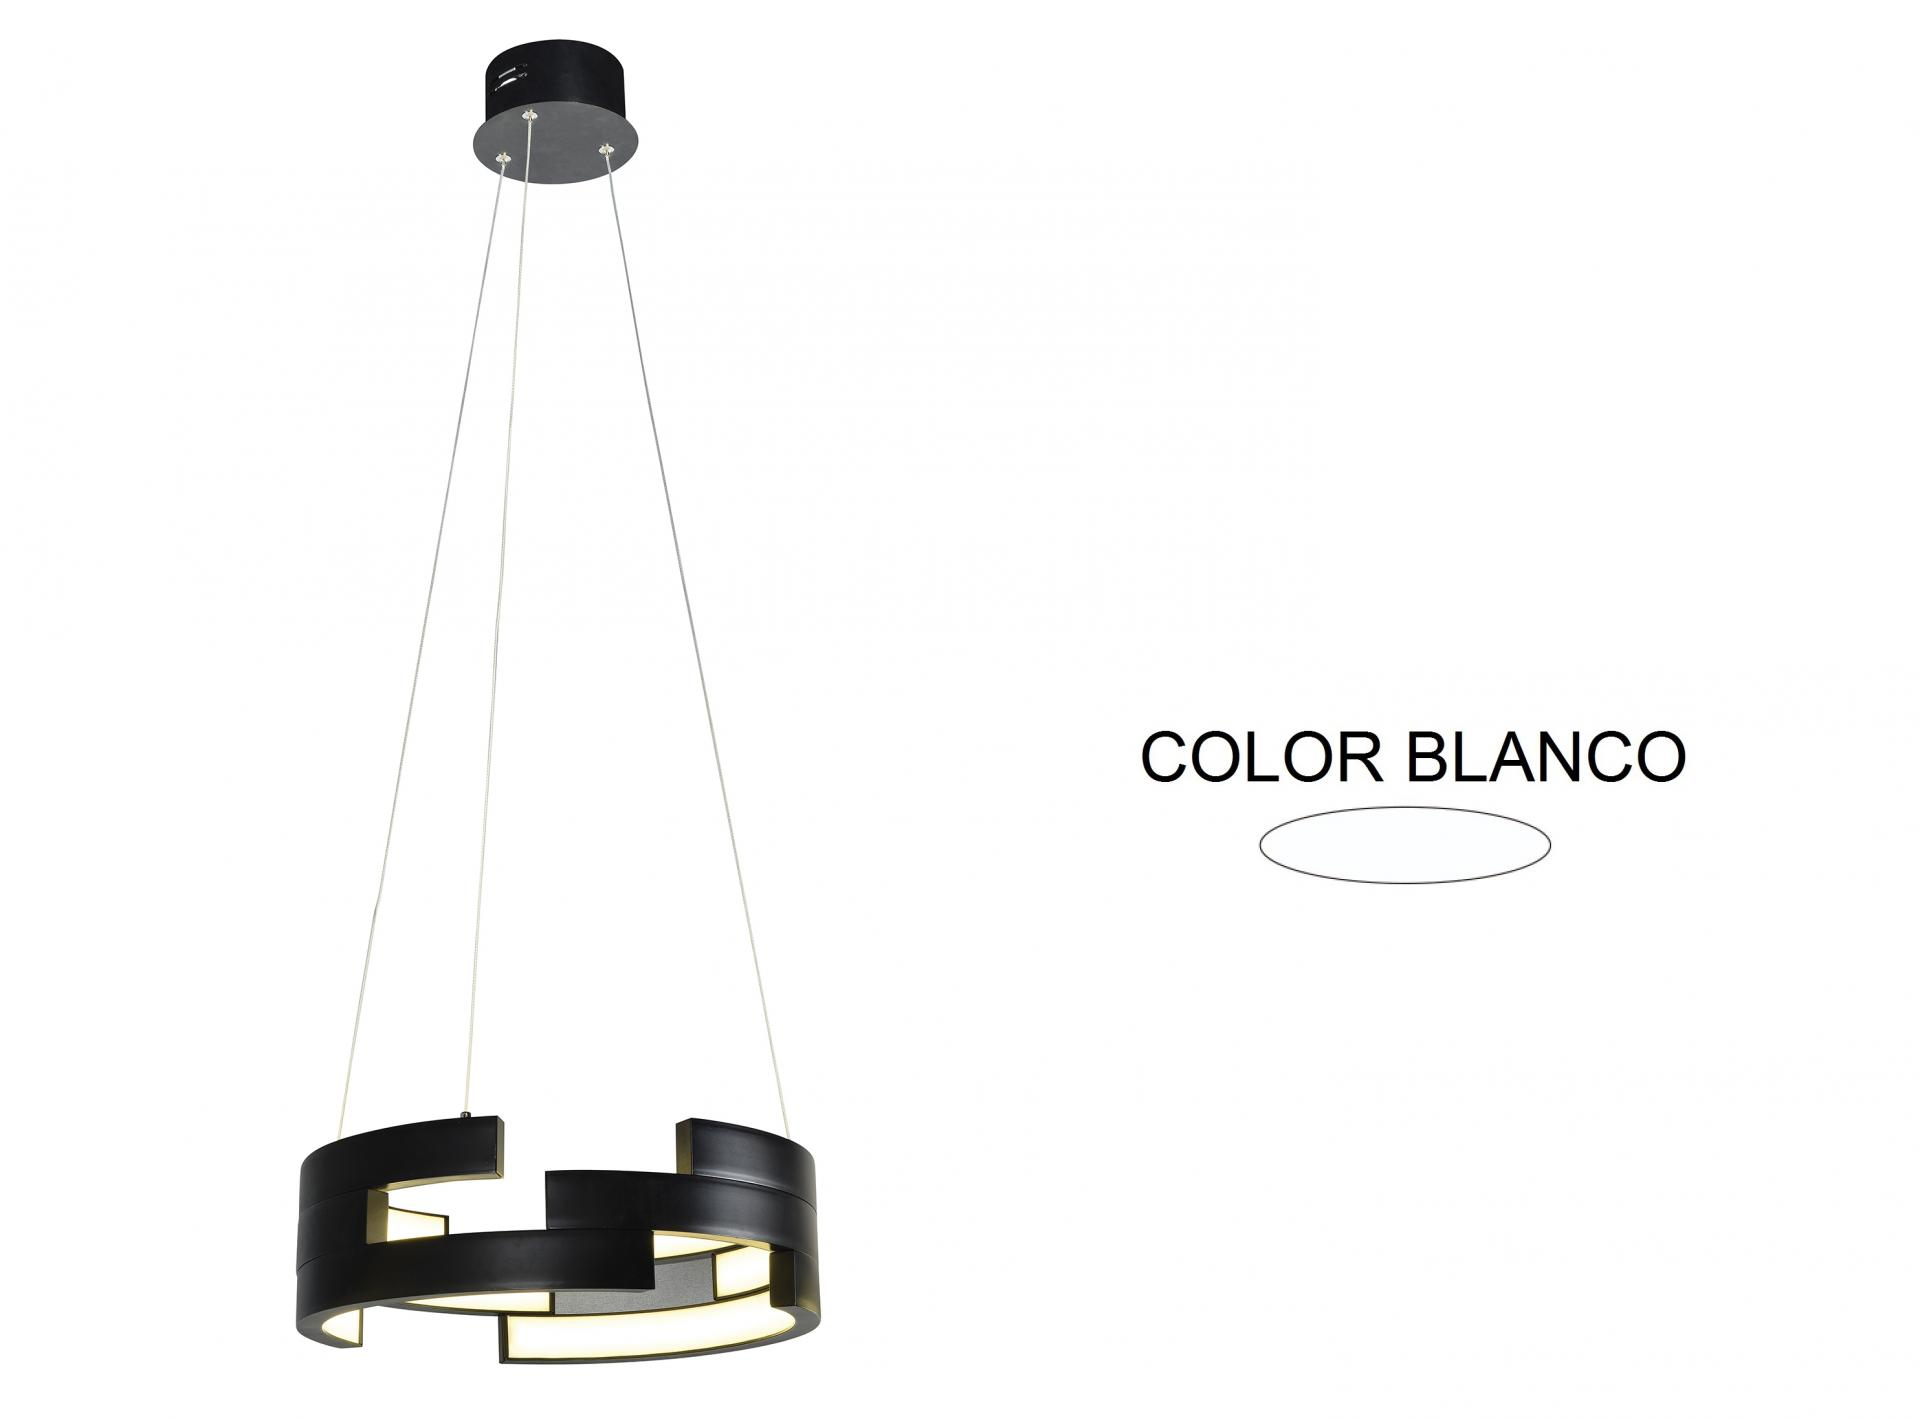 LAMPARA DE TECHO LED COLGANTE  ALUMINIO INTERIOR ACRILICO 78W 3000K 180º 230V BLANCO (F-BRIGTH)